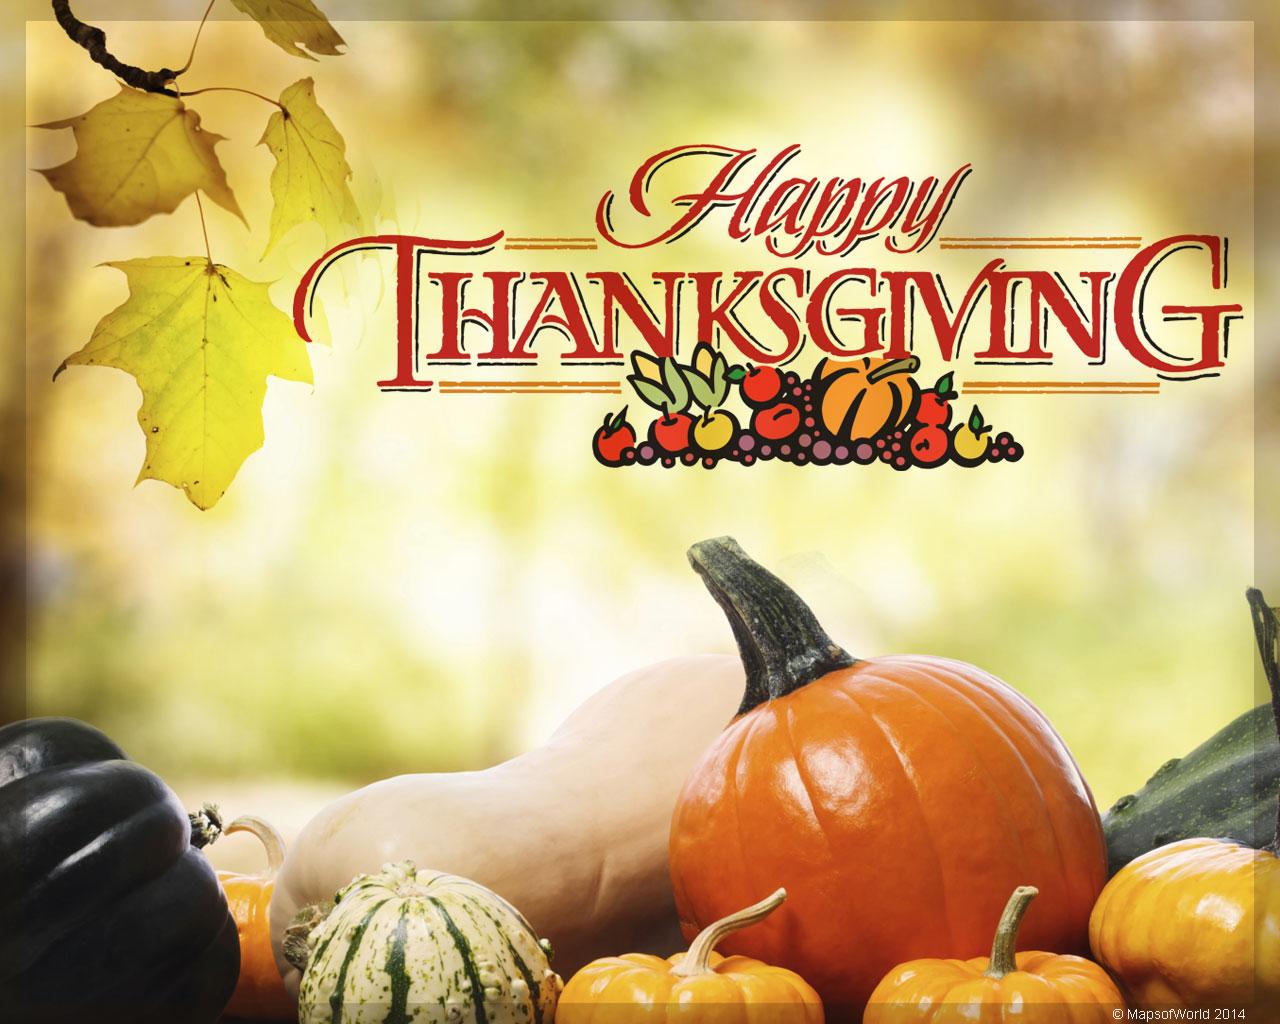 Happy Thanksgiving Message - HD Wallpaper